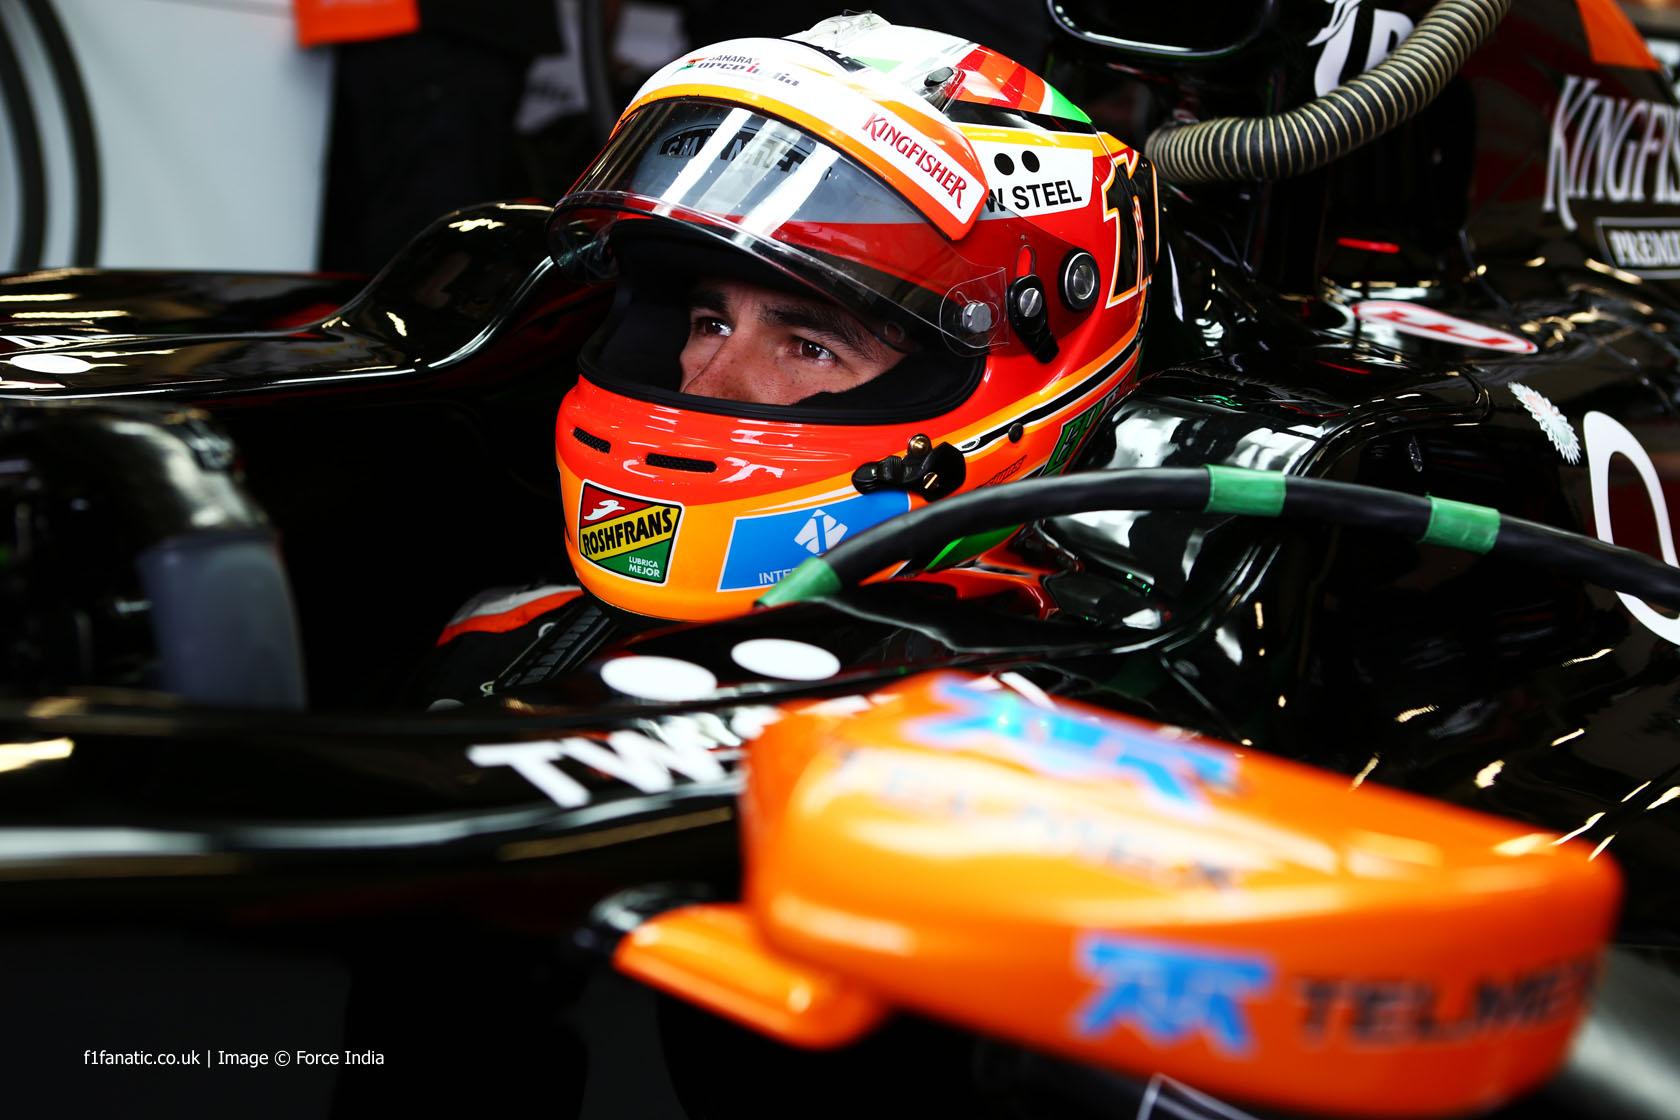 Sergio Perez, Force India, Silverstone, 2014